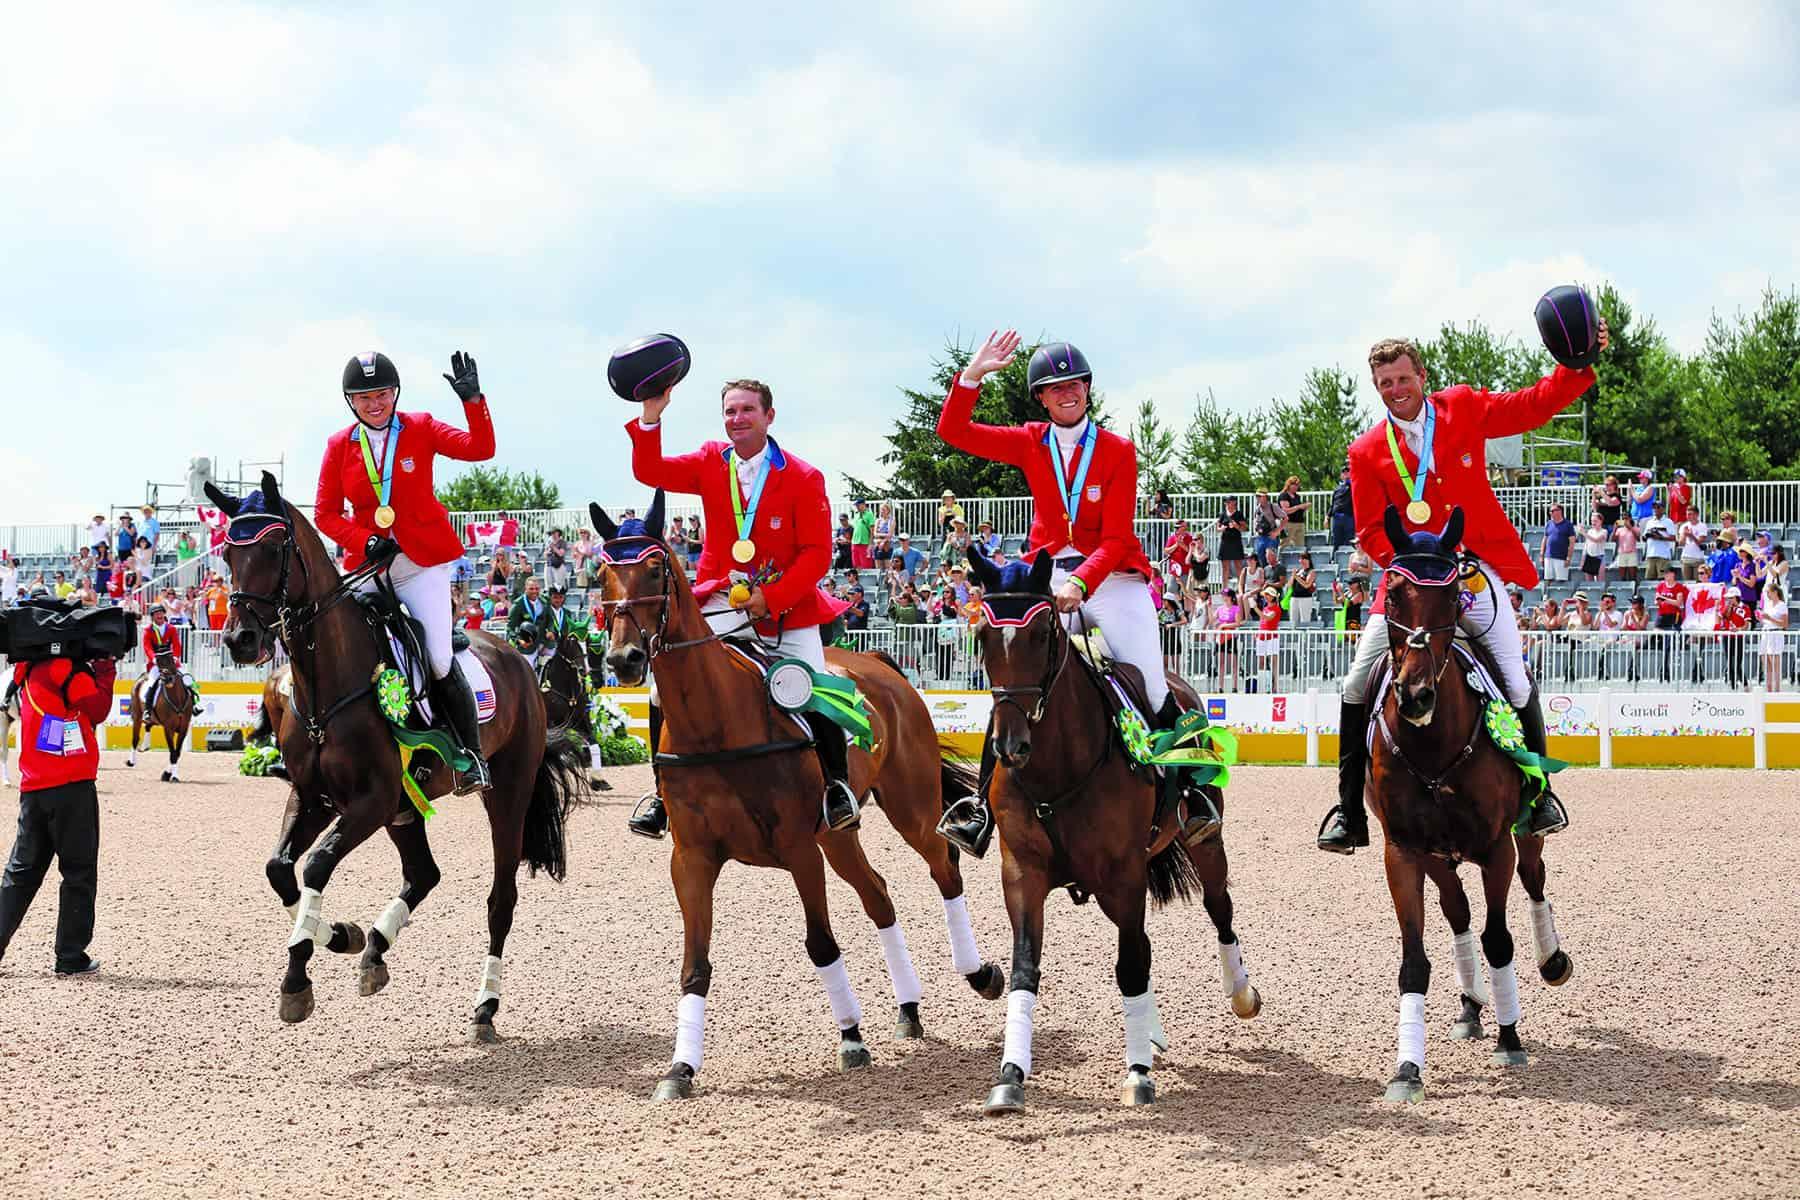 Marilyn Little, Boyd Martin, Phillip Dutton and Lauren Kieffer at the 2015 Pan Ams